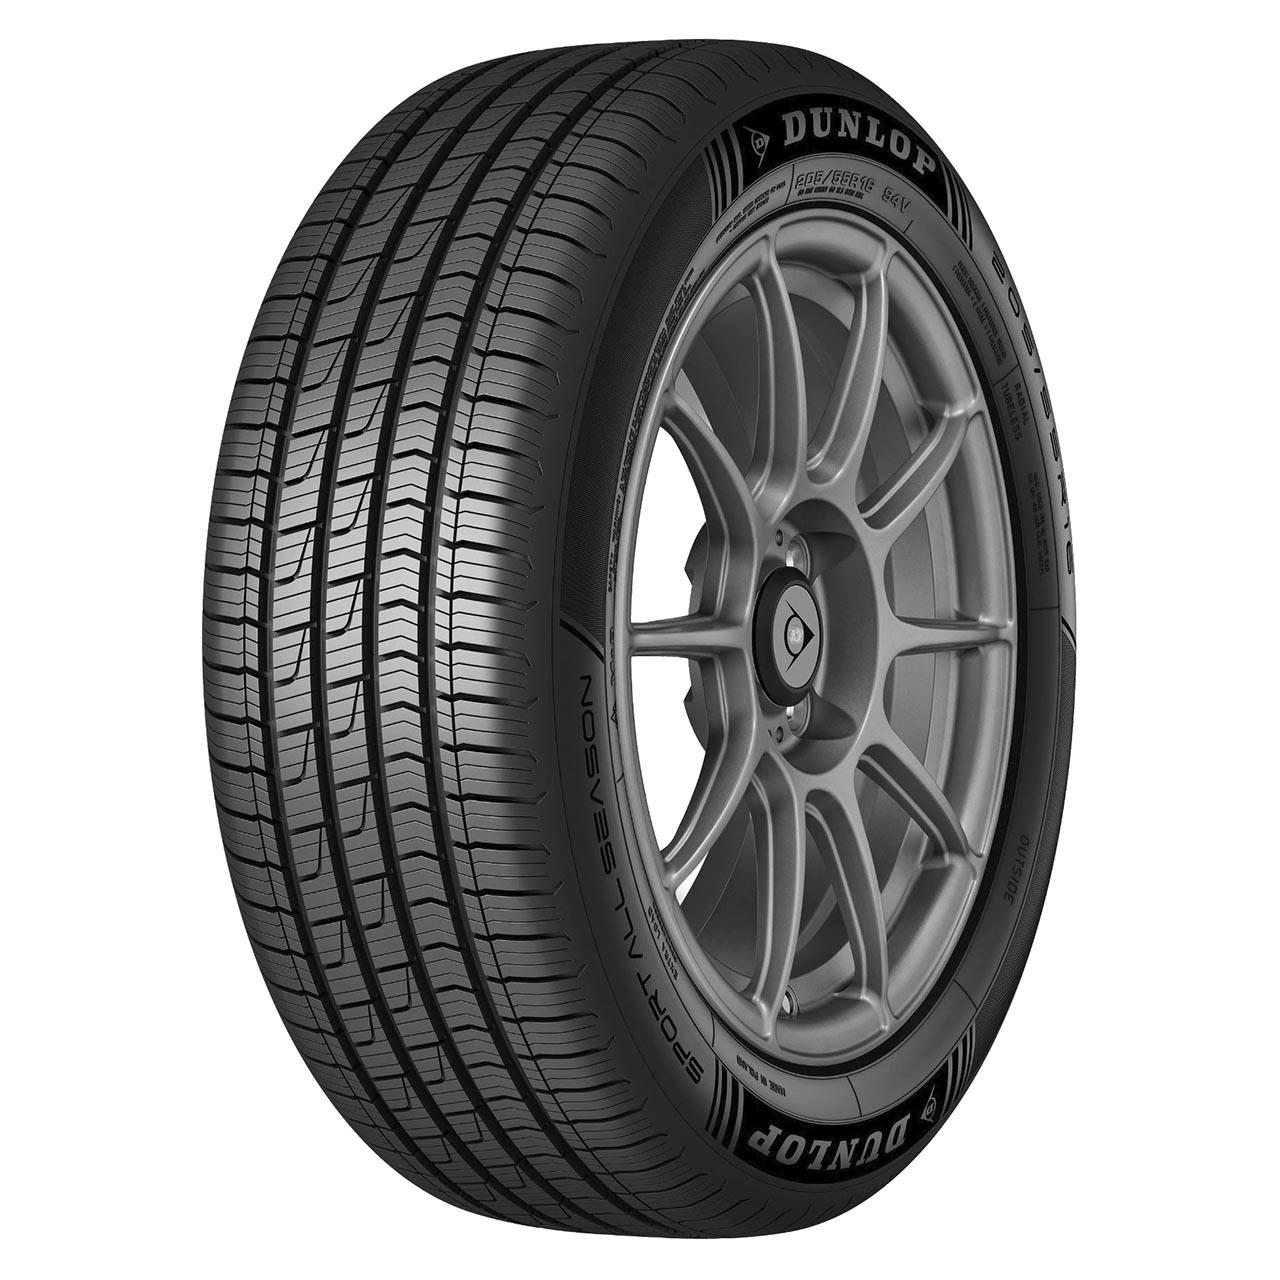 Dunlop Sport ALL Season 195/65R15 95V XL